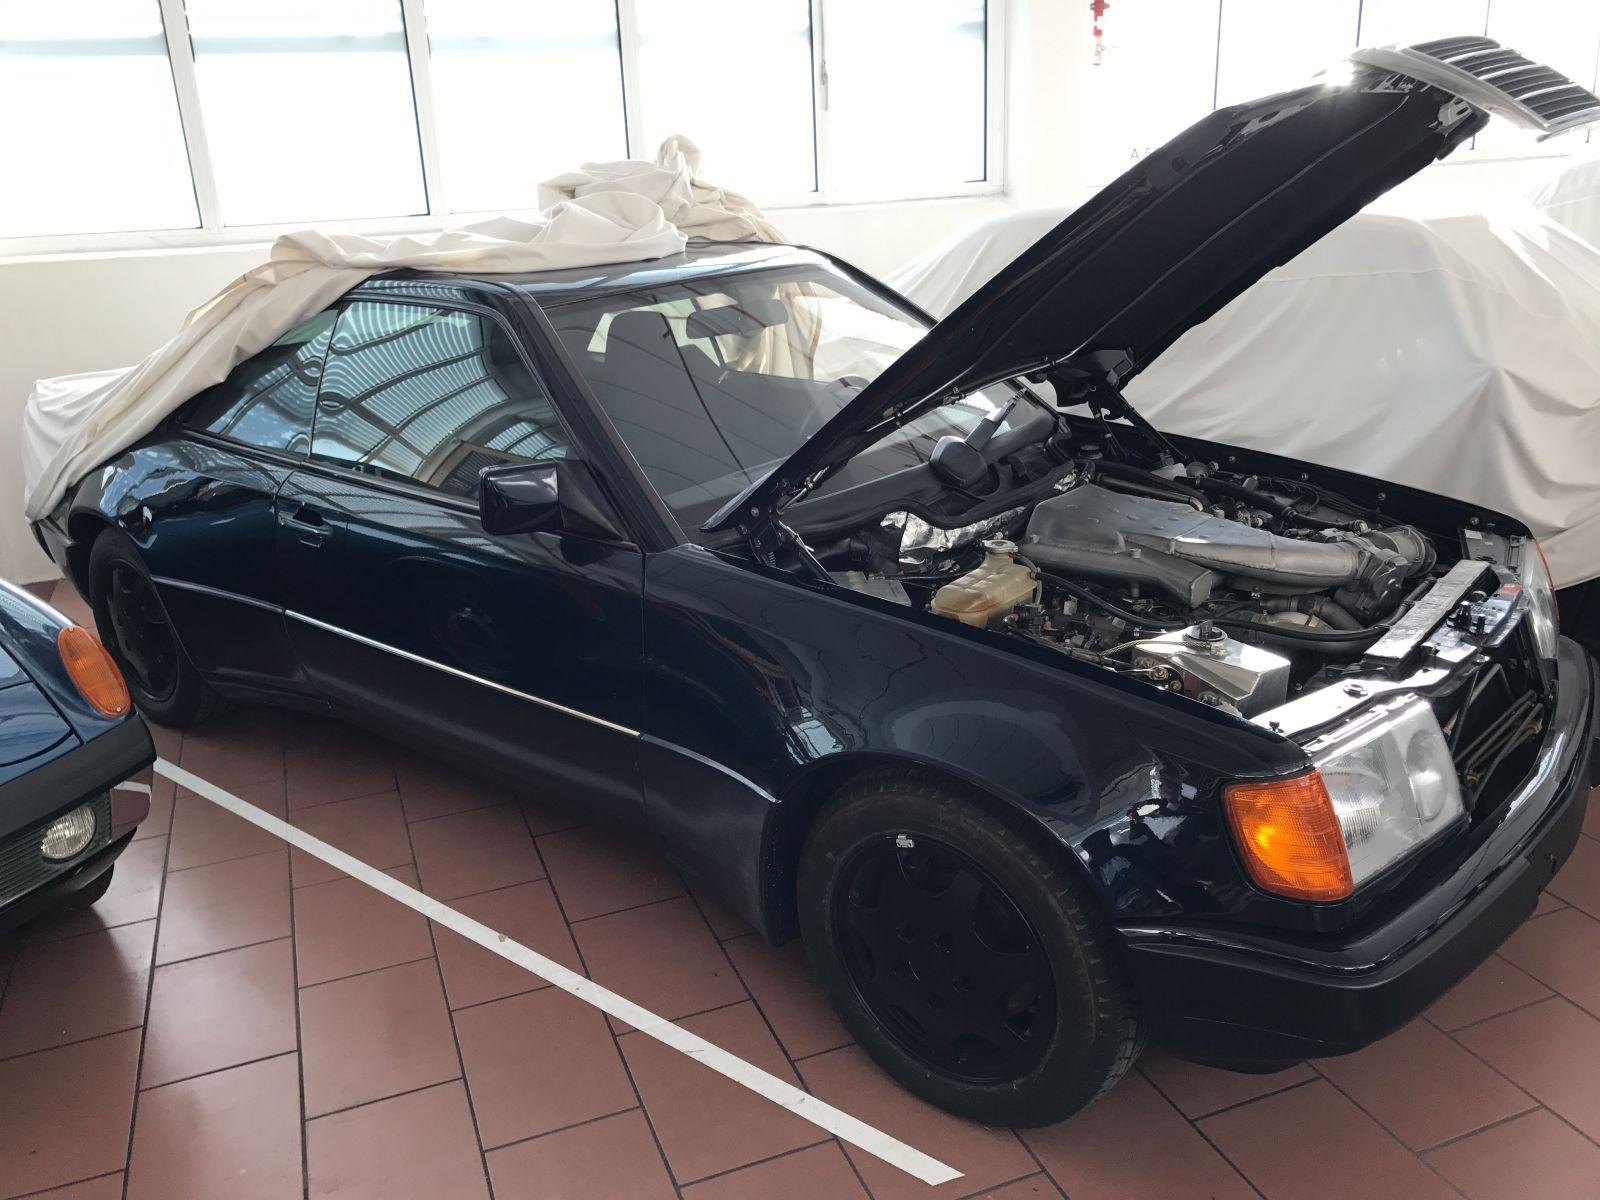 W124 500e Coupe Prototype Uncovered At Porsche